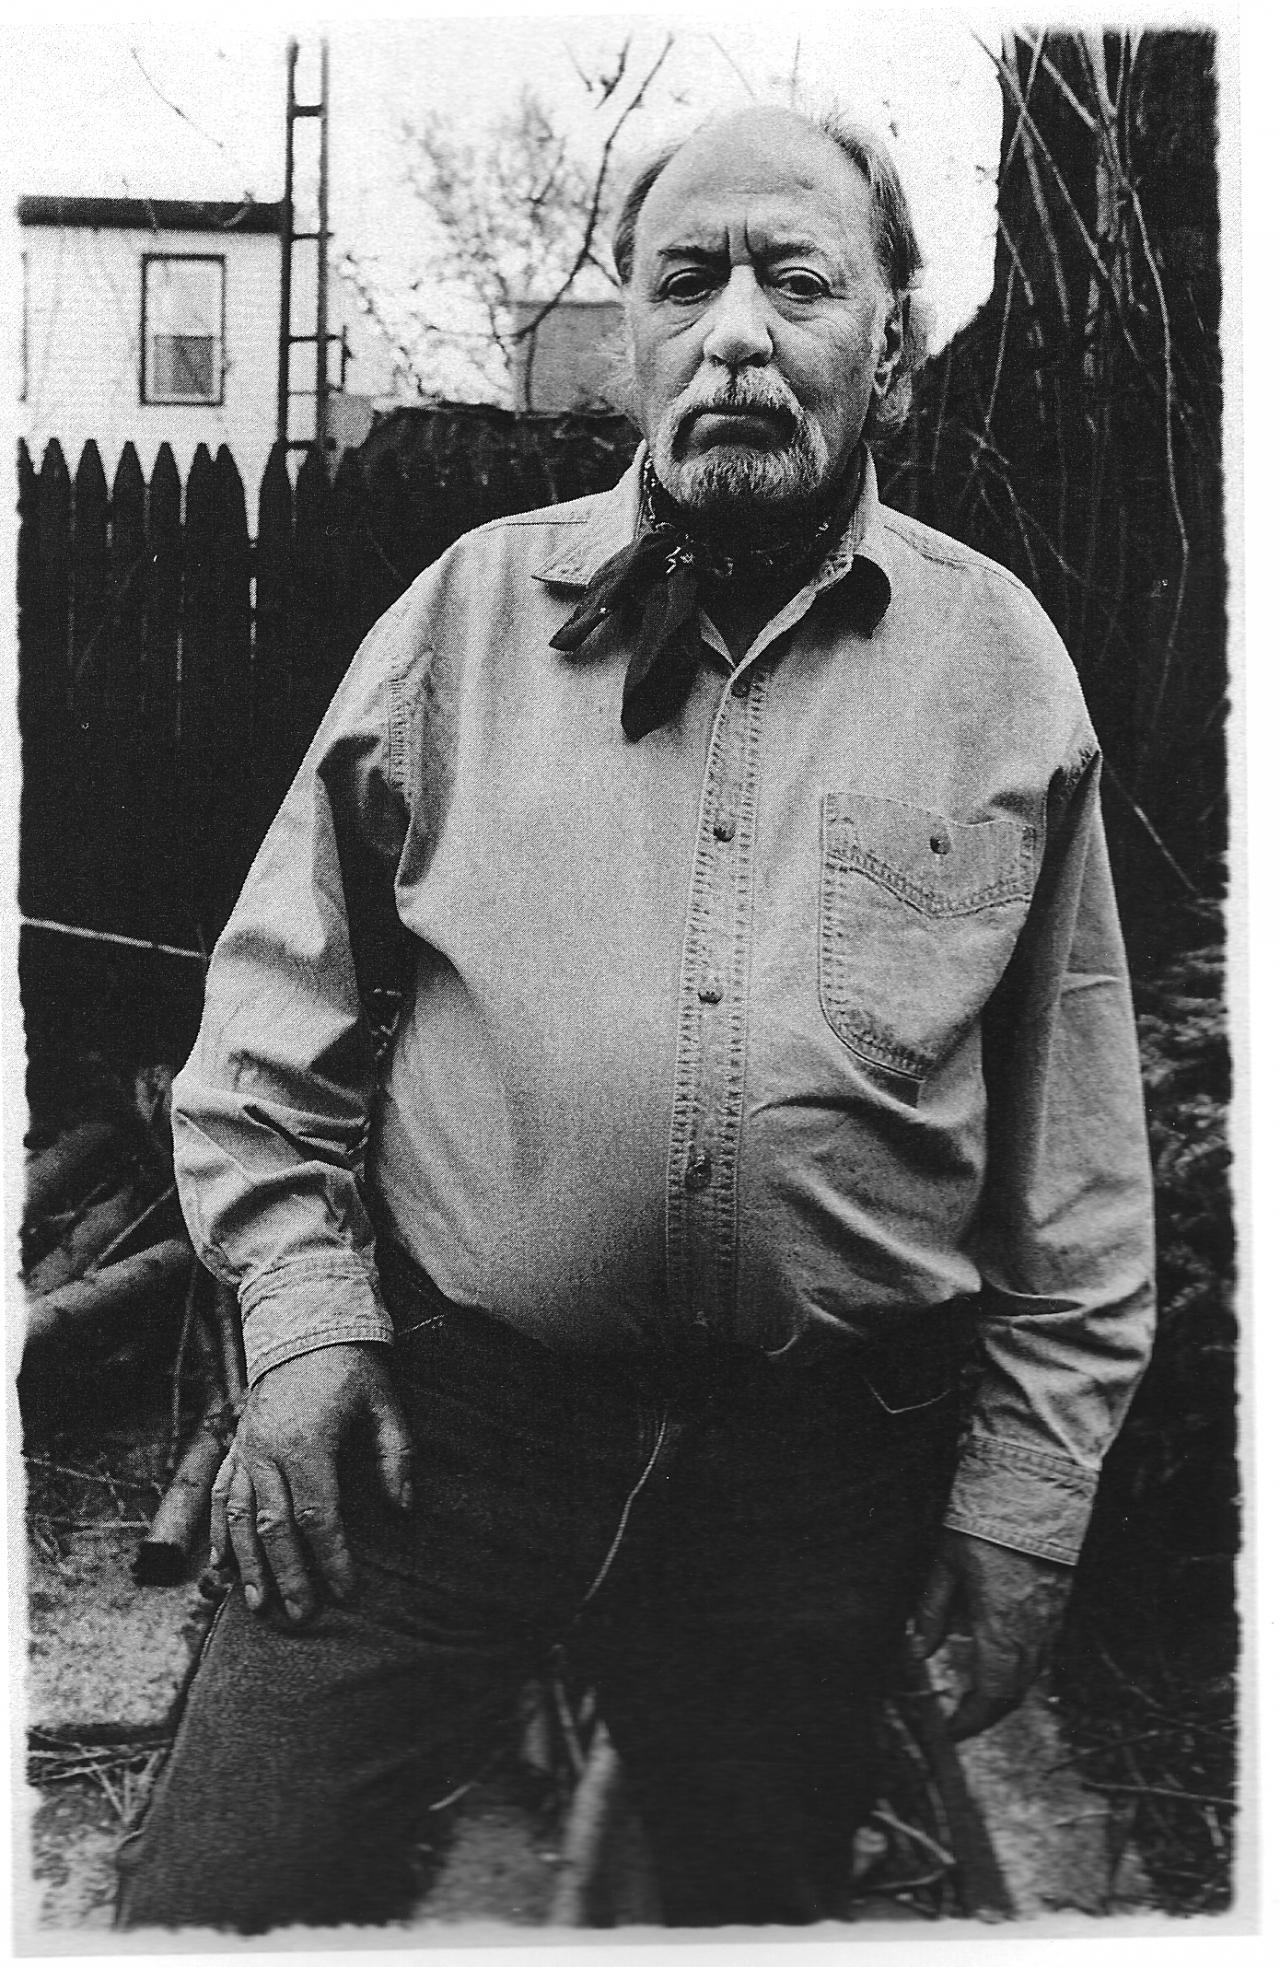 Aldo Tambellini, »Portrait of Aldo Tambellini« - TAMBELLINI_by_ Gerard Malanga